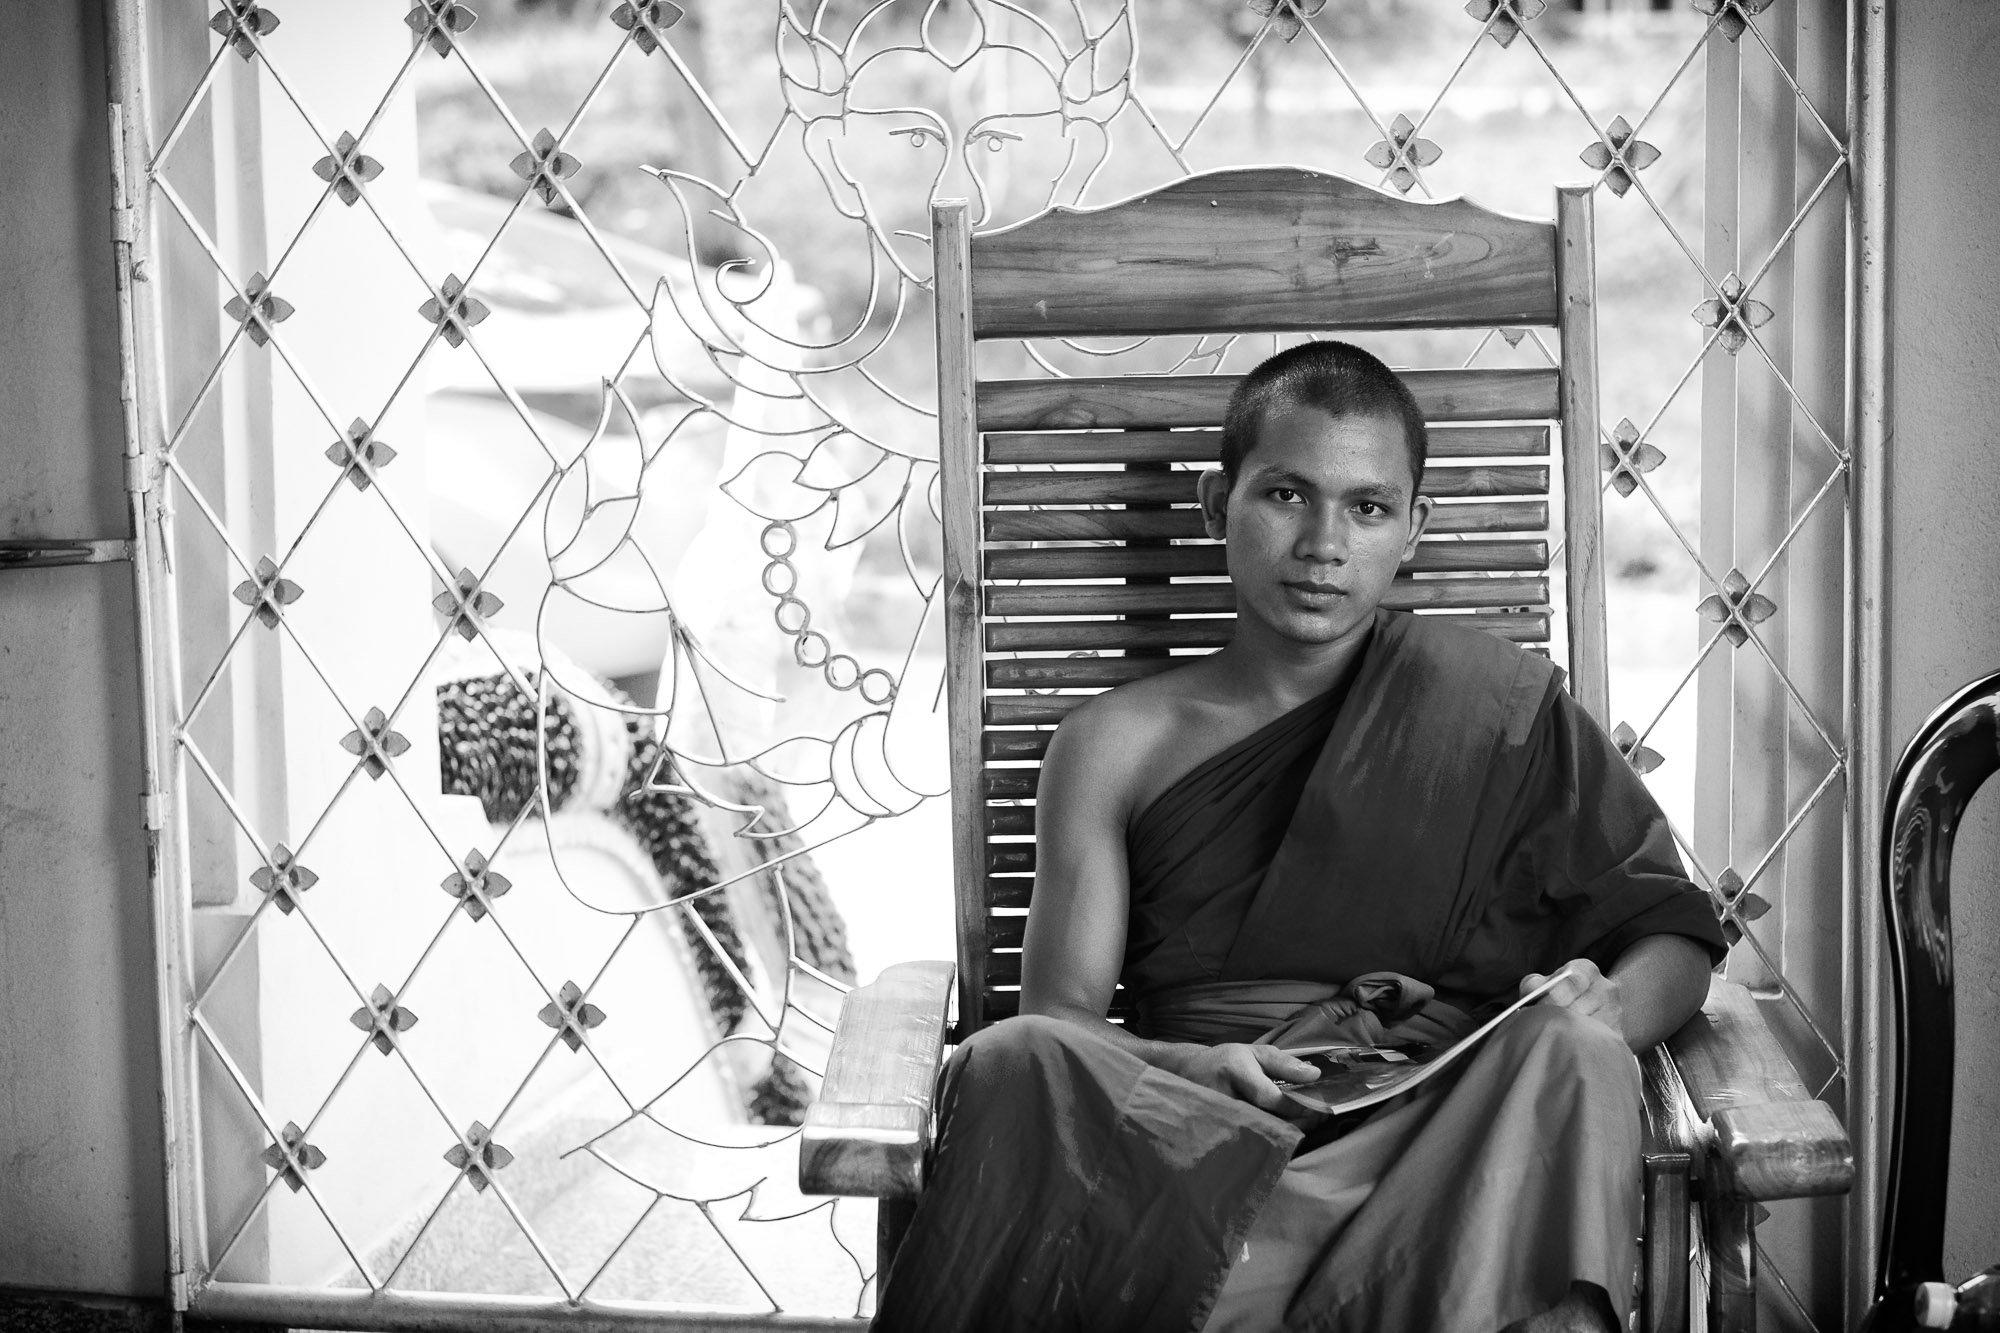 buddhist VIENTIANE Laos asia street photography photographer monk